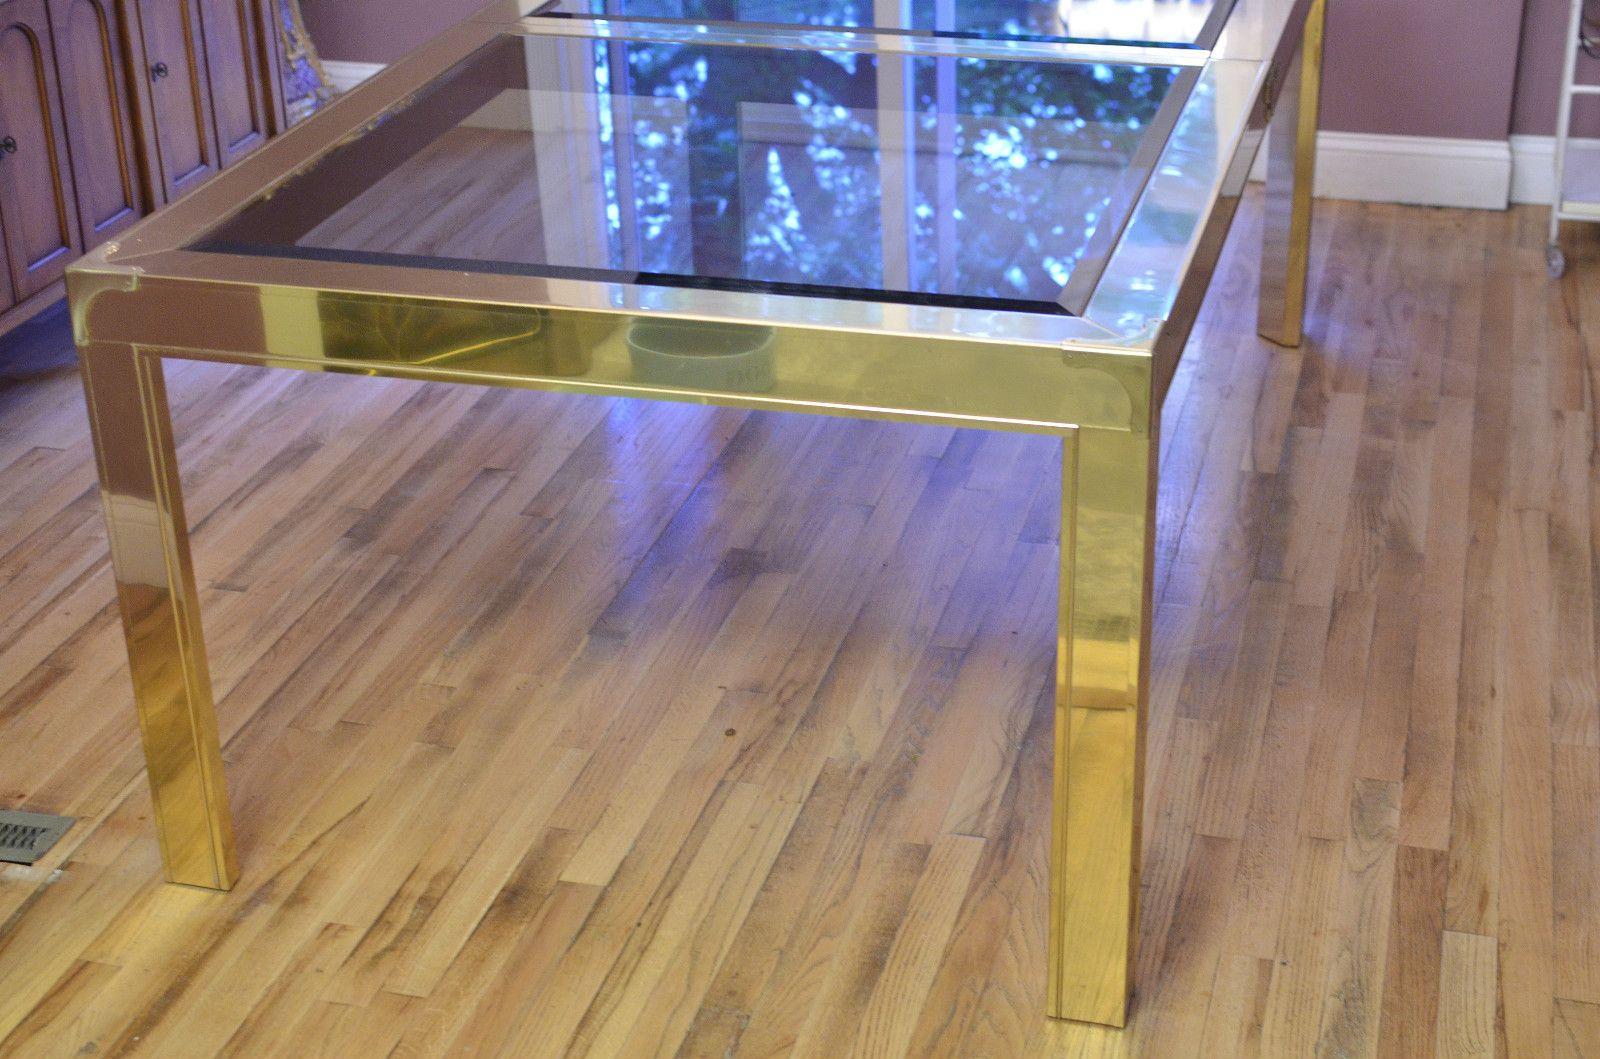 Mastercraft brass dining table - Hollywood Regency Mastercraft Furniture Brass Dining Table Glass Mid Century